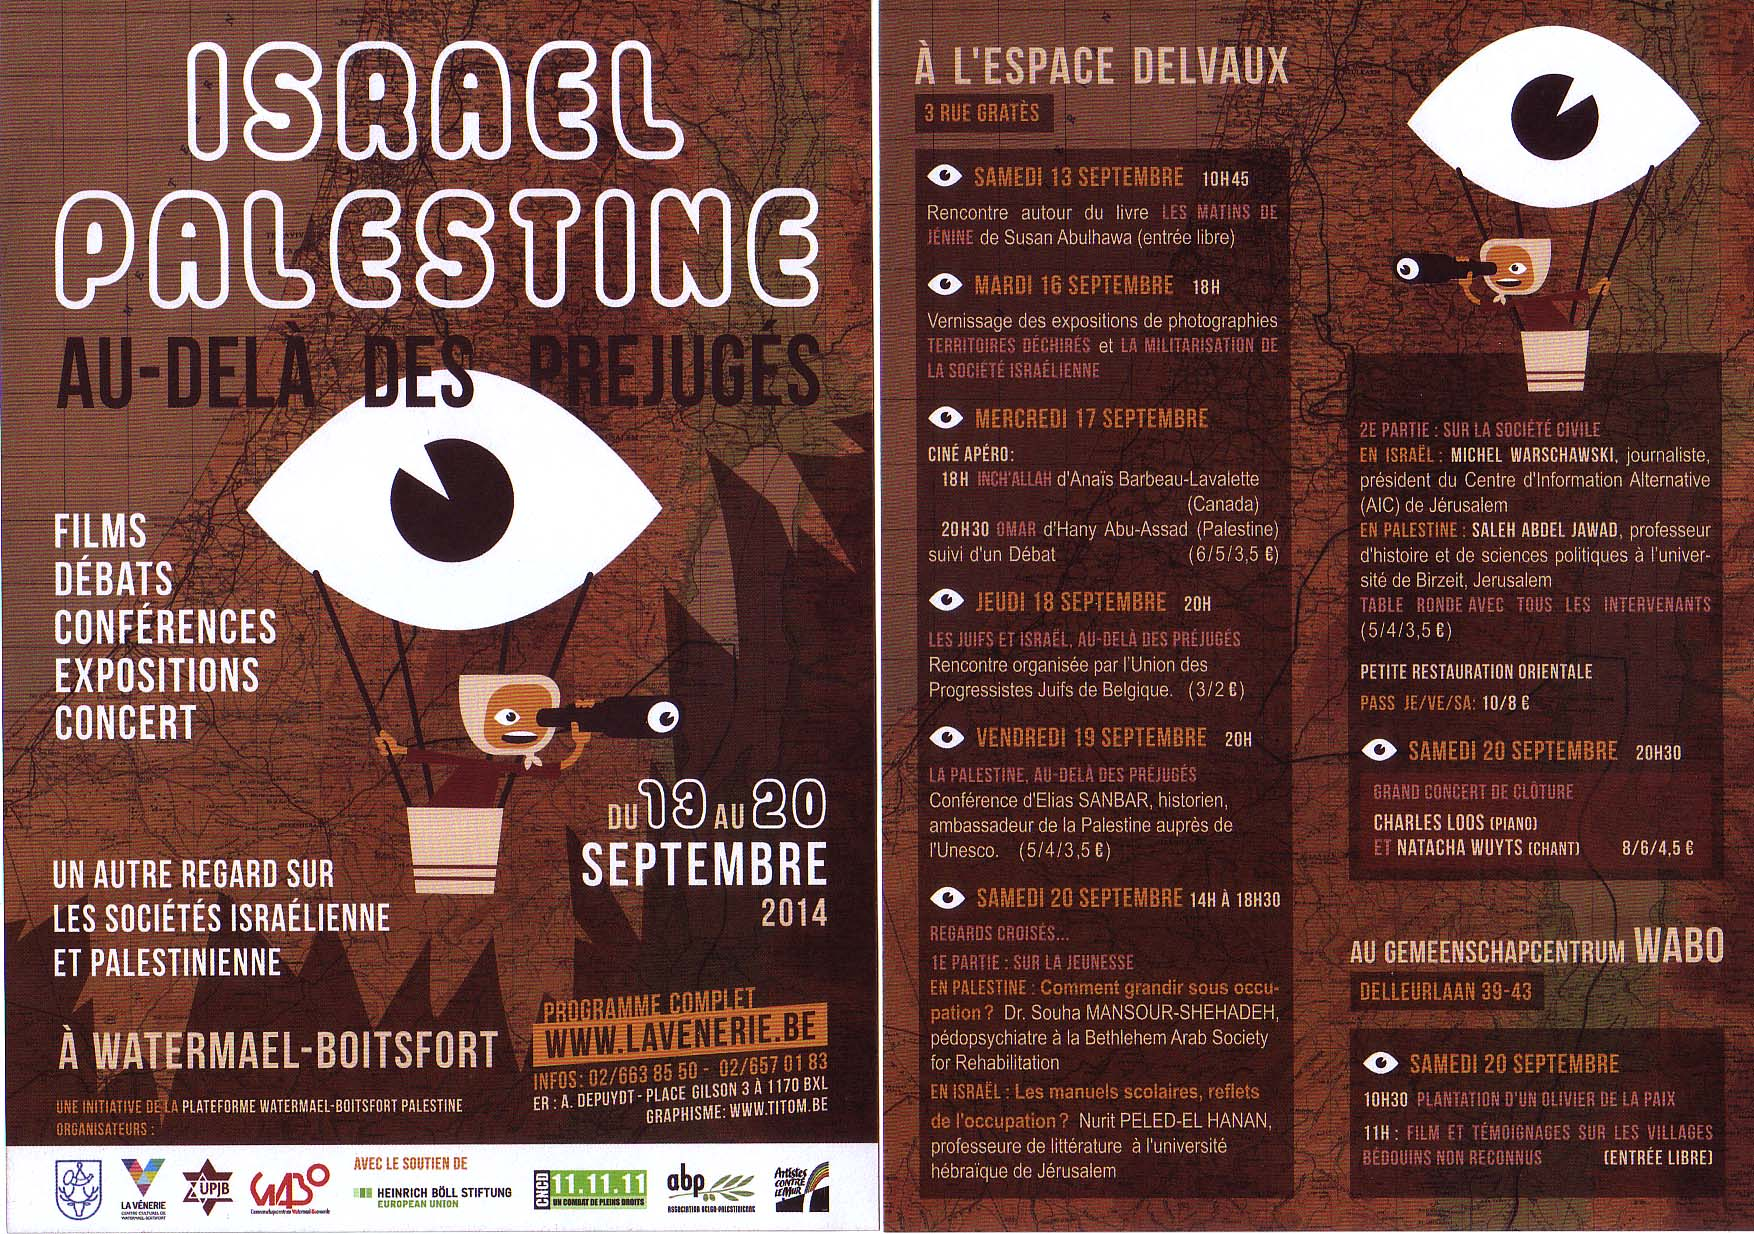 Plateforme Watermael-Boitsfort Palestine